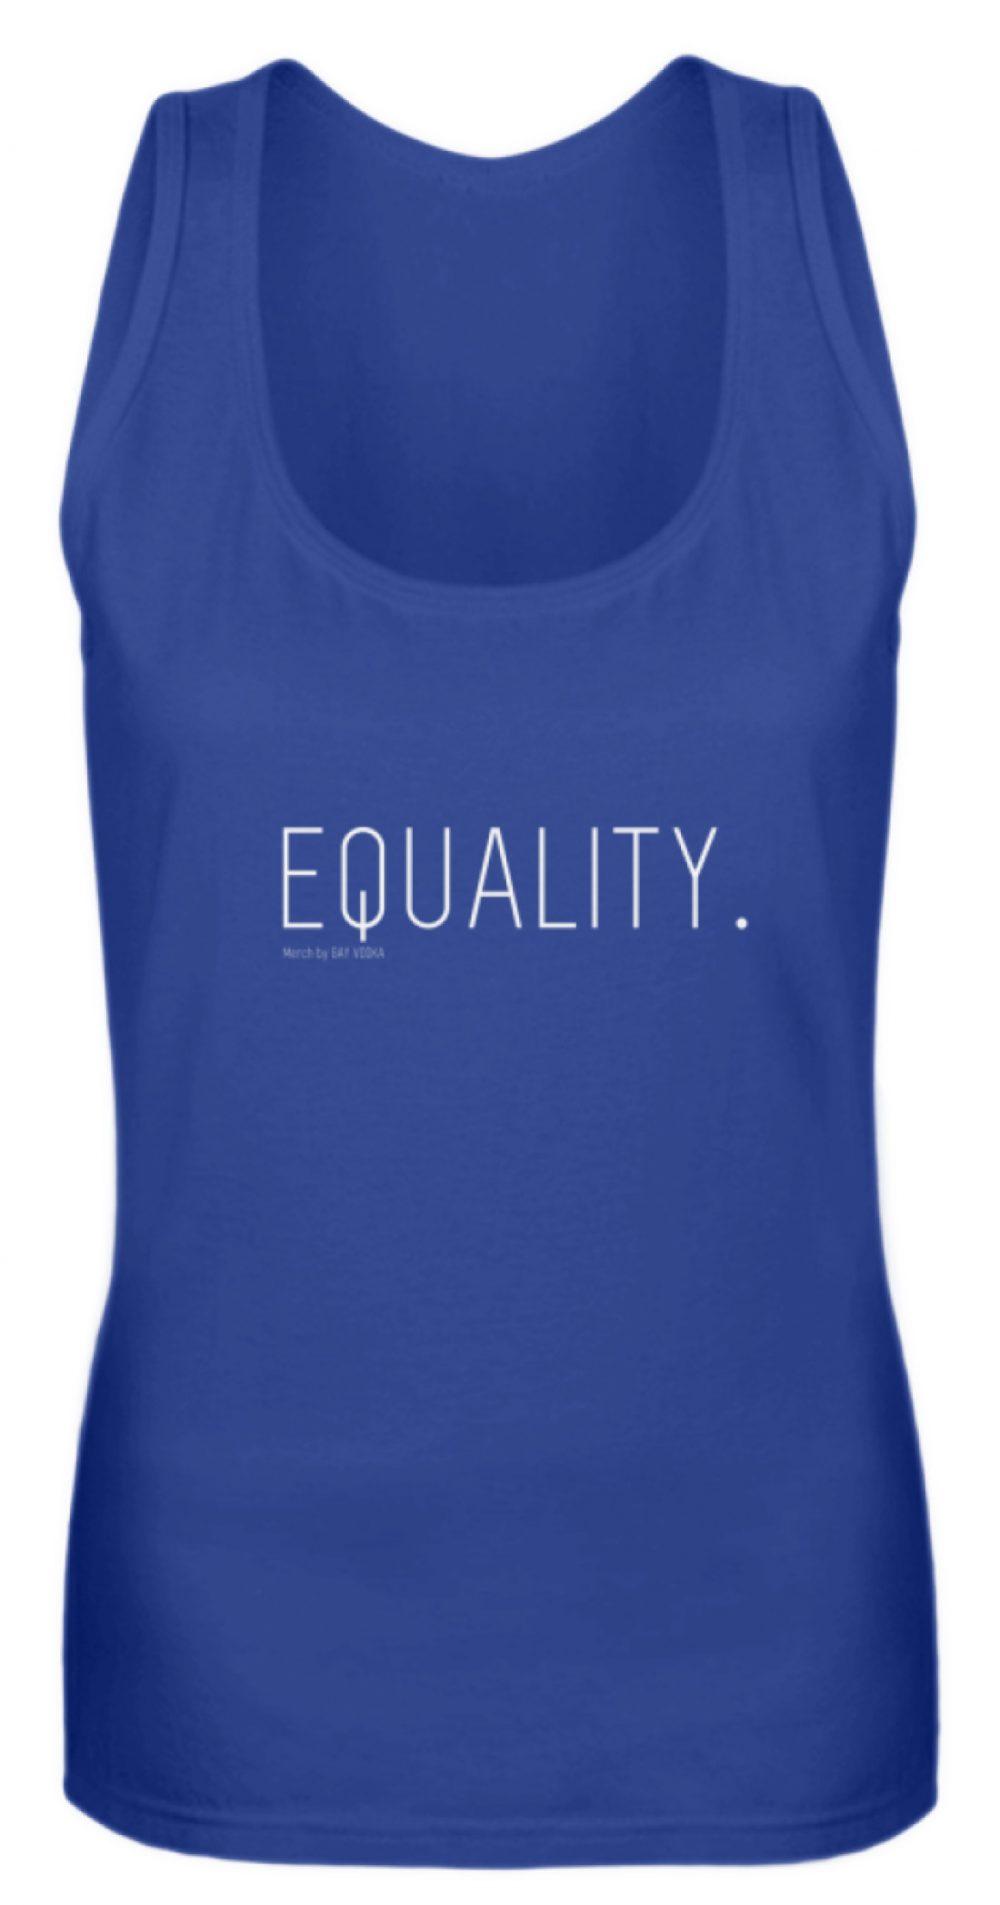 EQUALITY. - Frauen Tanktop-27